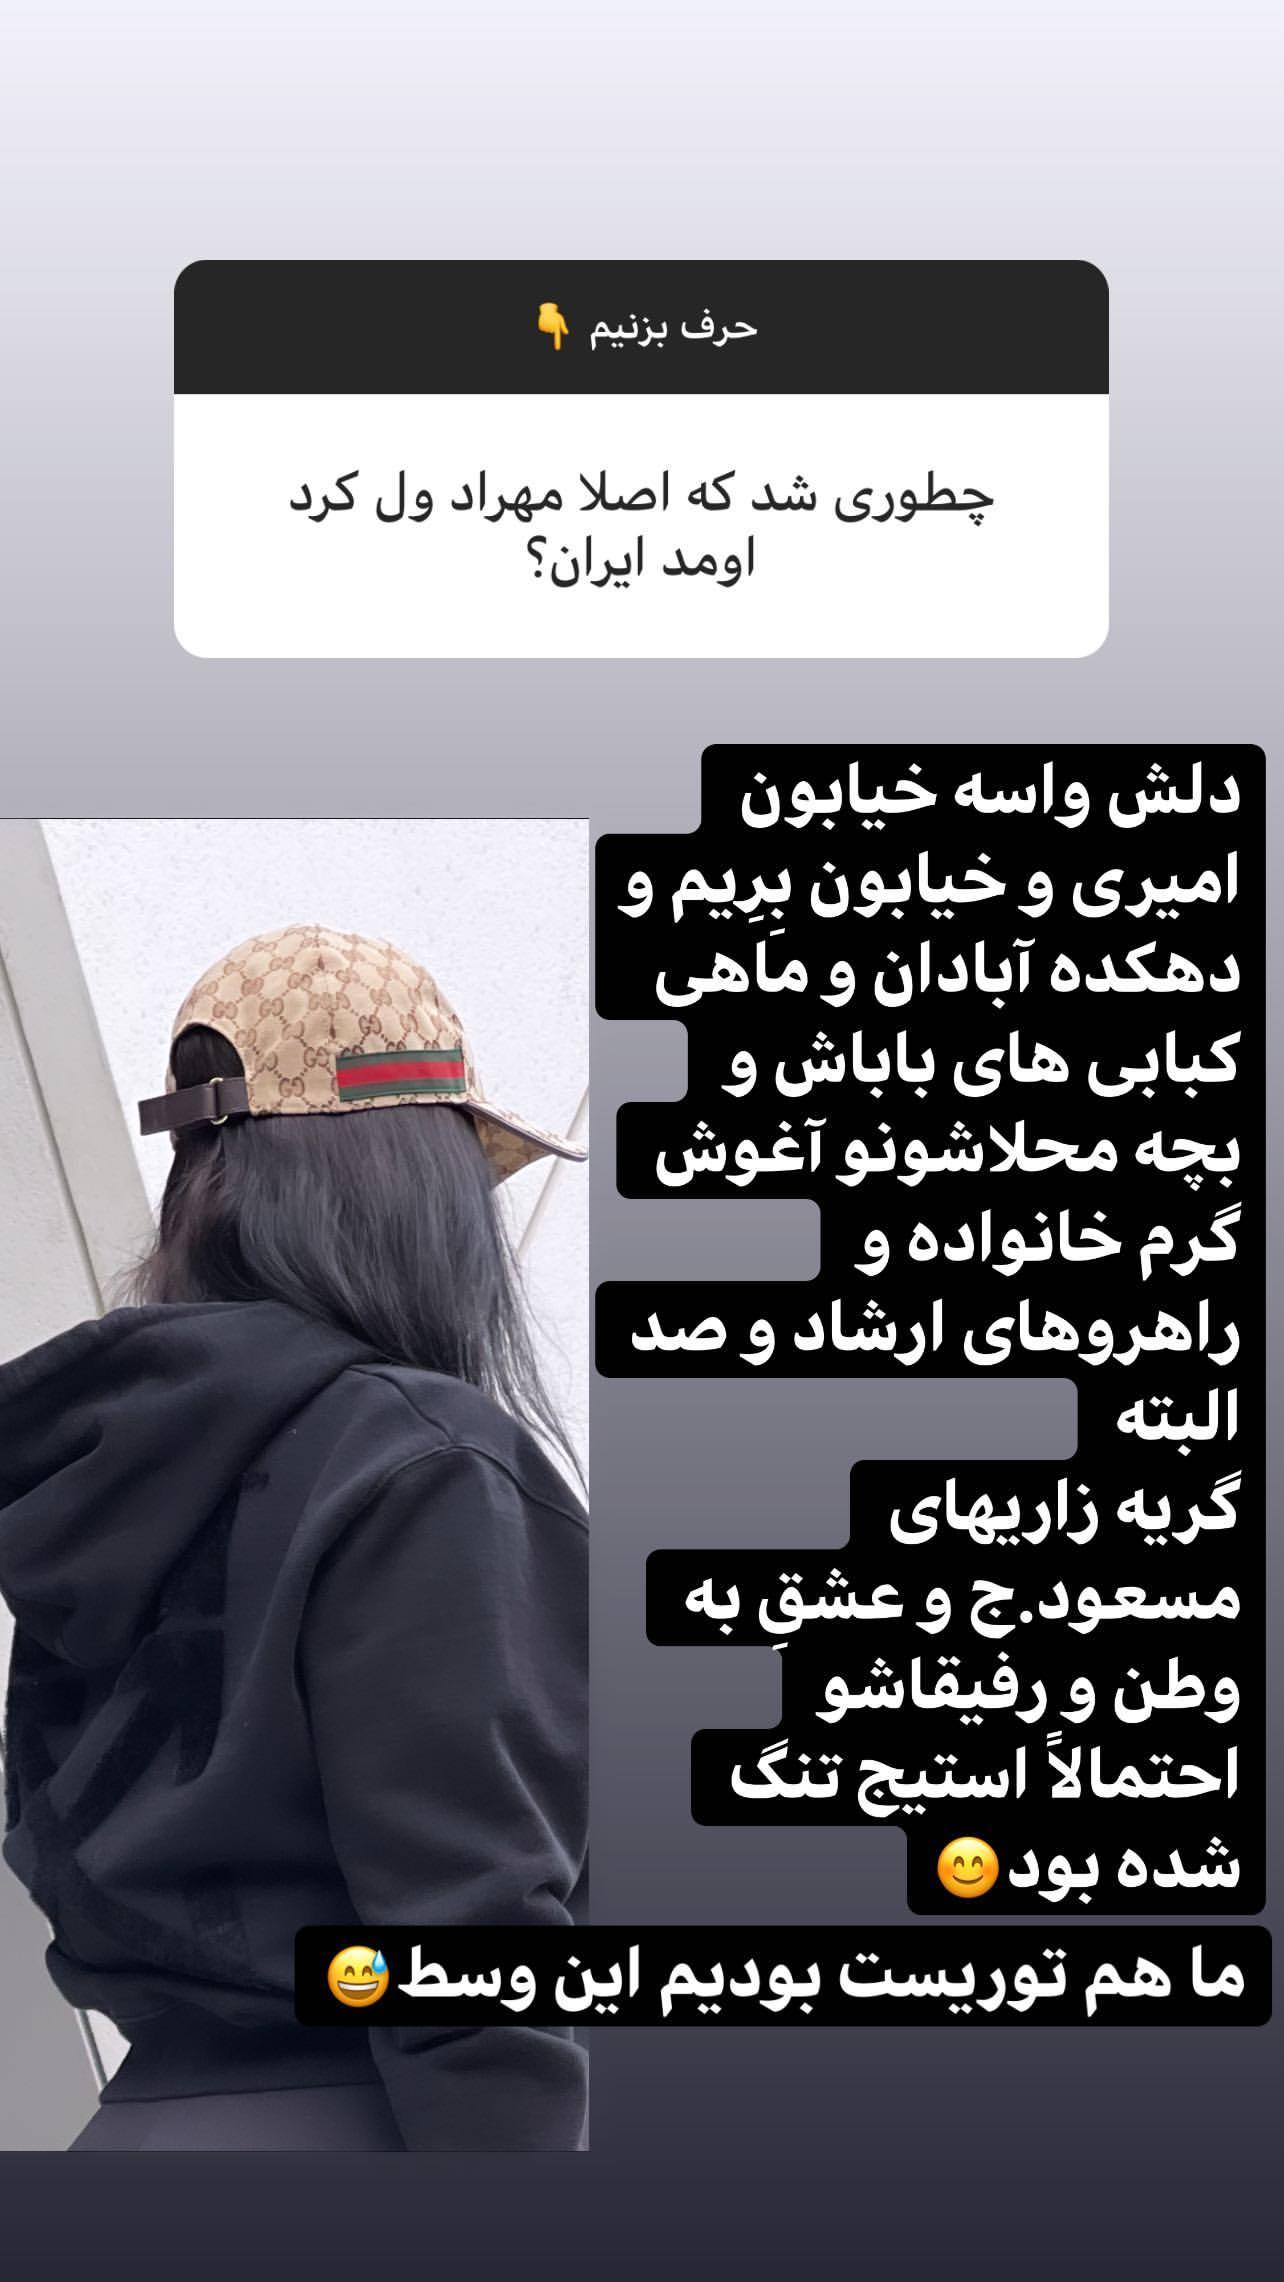 donya_2676731097909349750_373148161